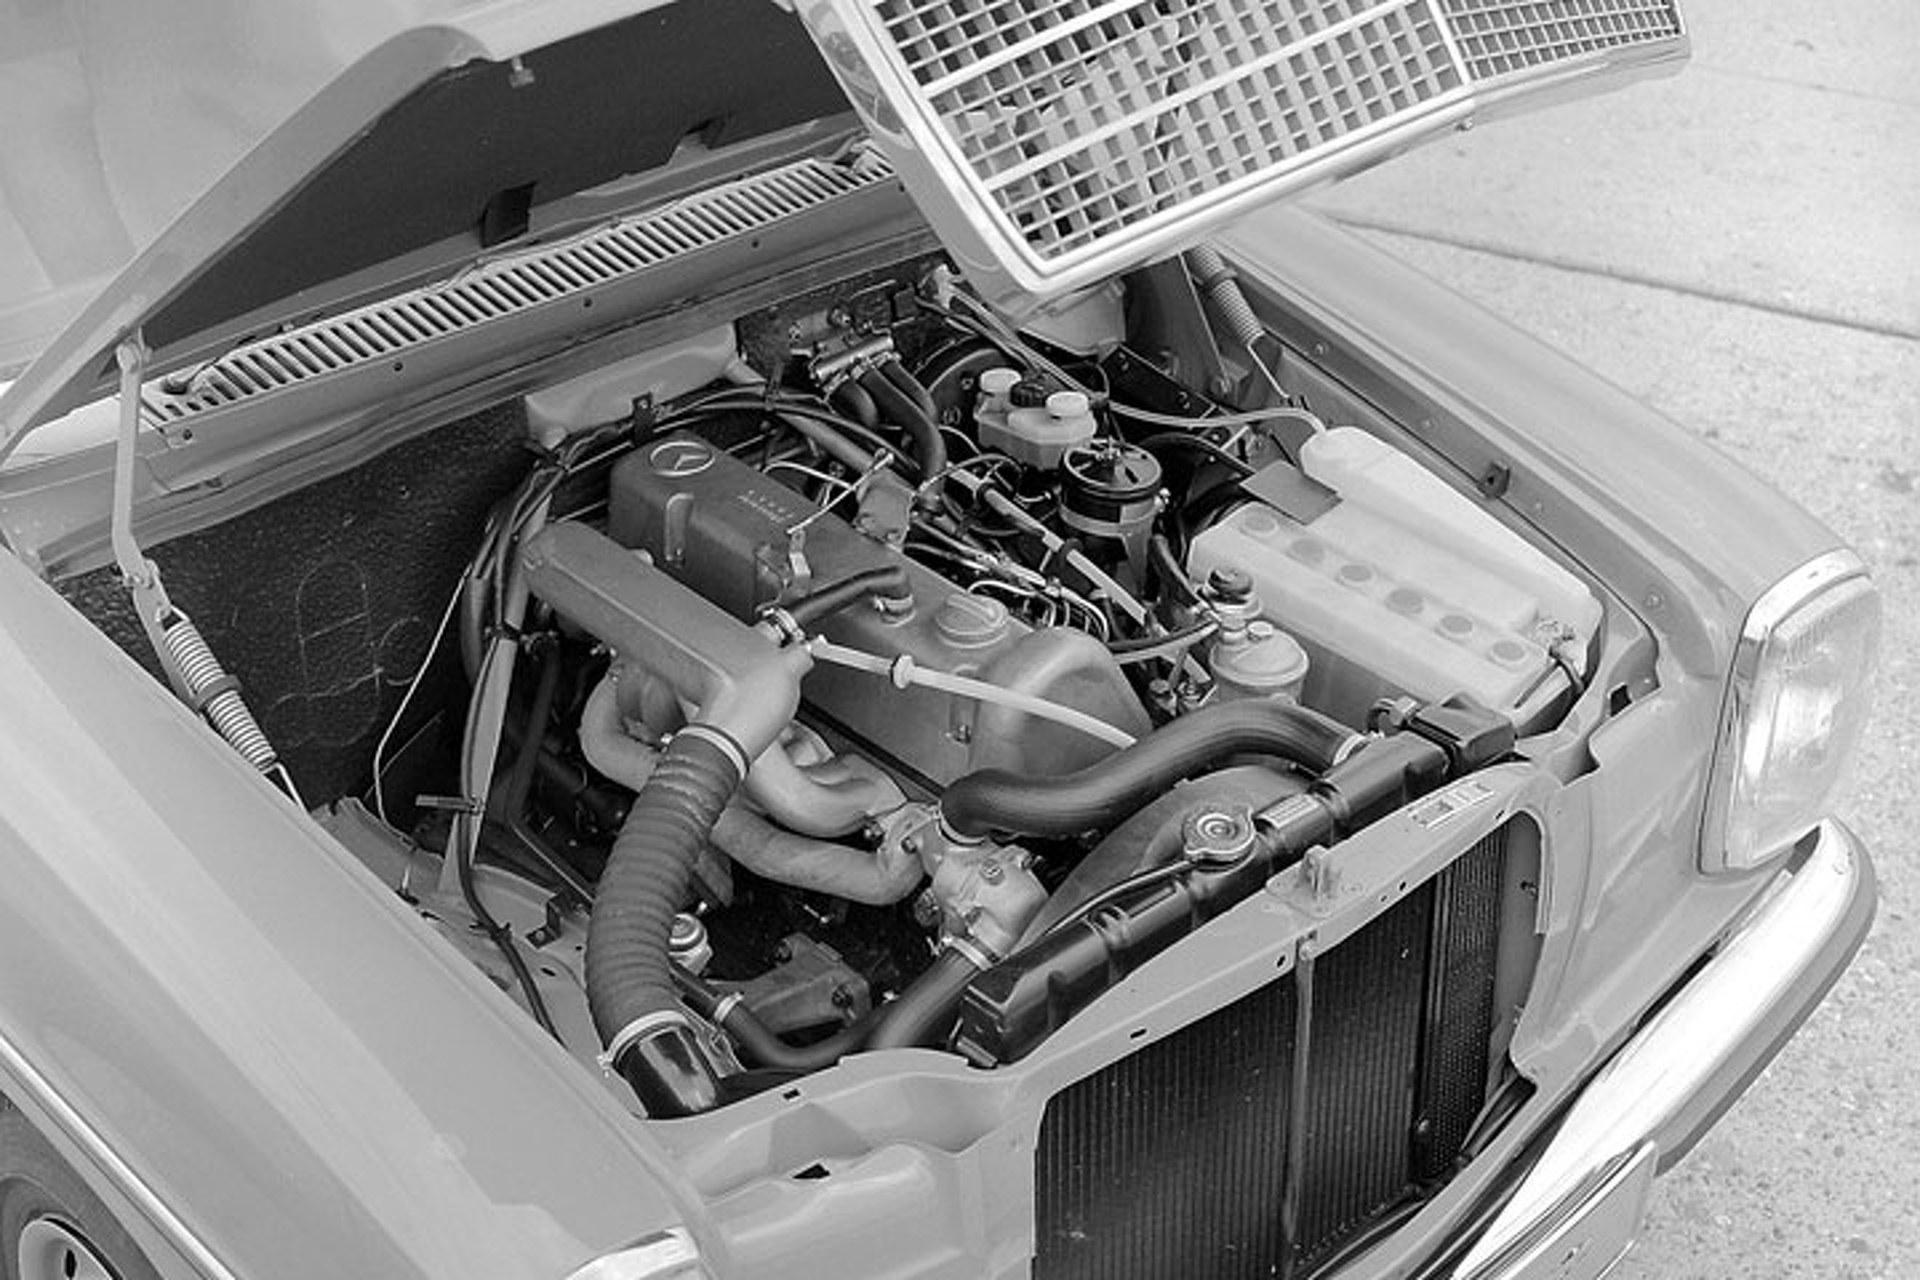 Four Decades: Mercedes Celebrates its Revolutionary Five-Cylinder Diesel